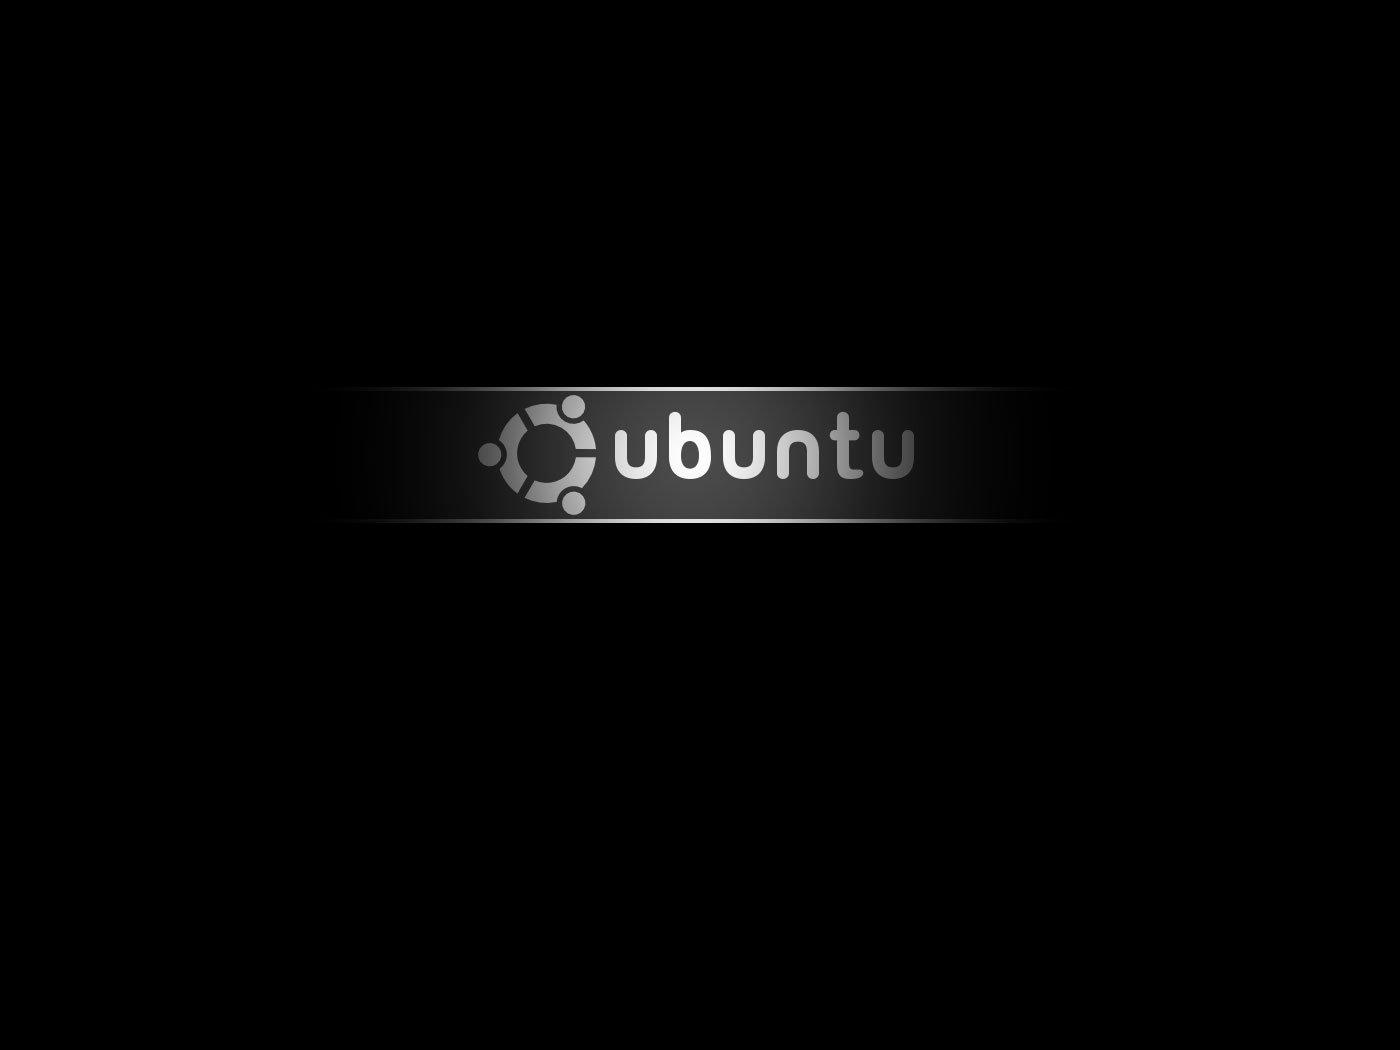 Black Ubuntu wallpaper 1400x1050